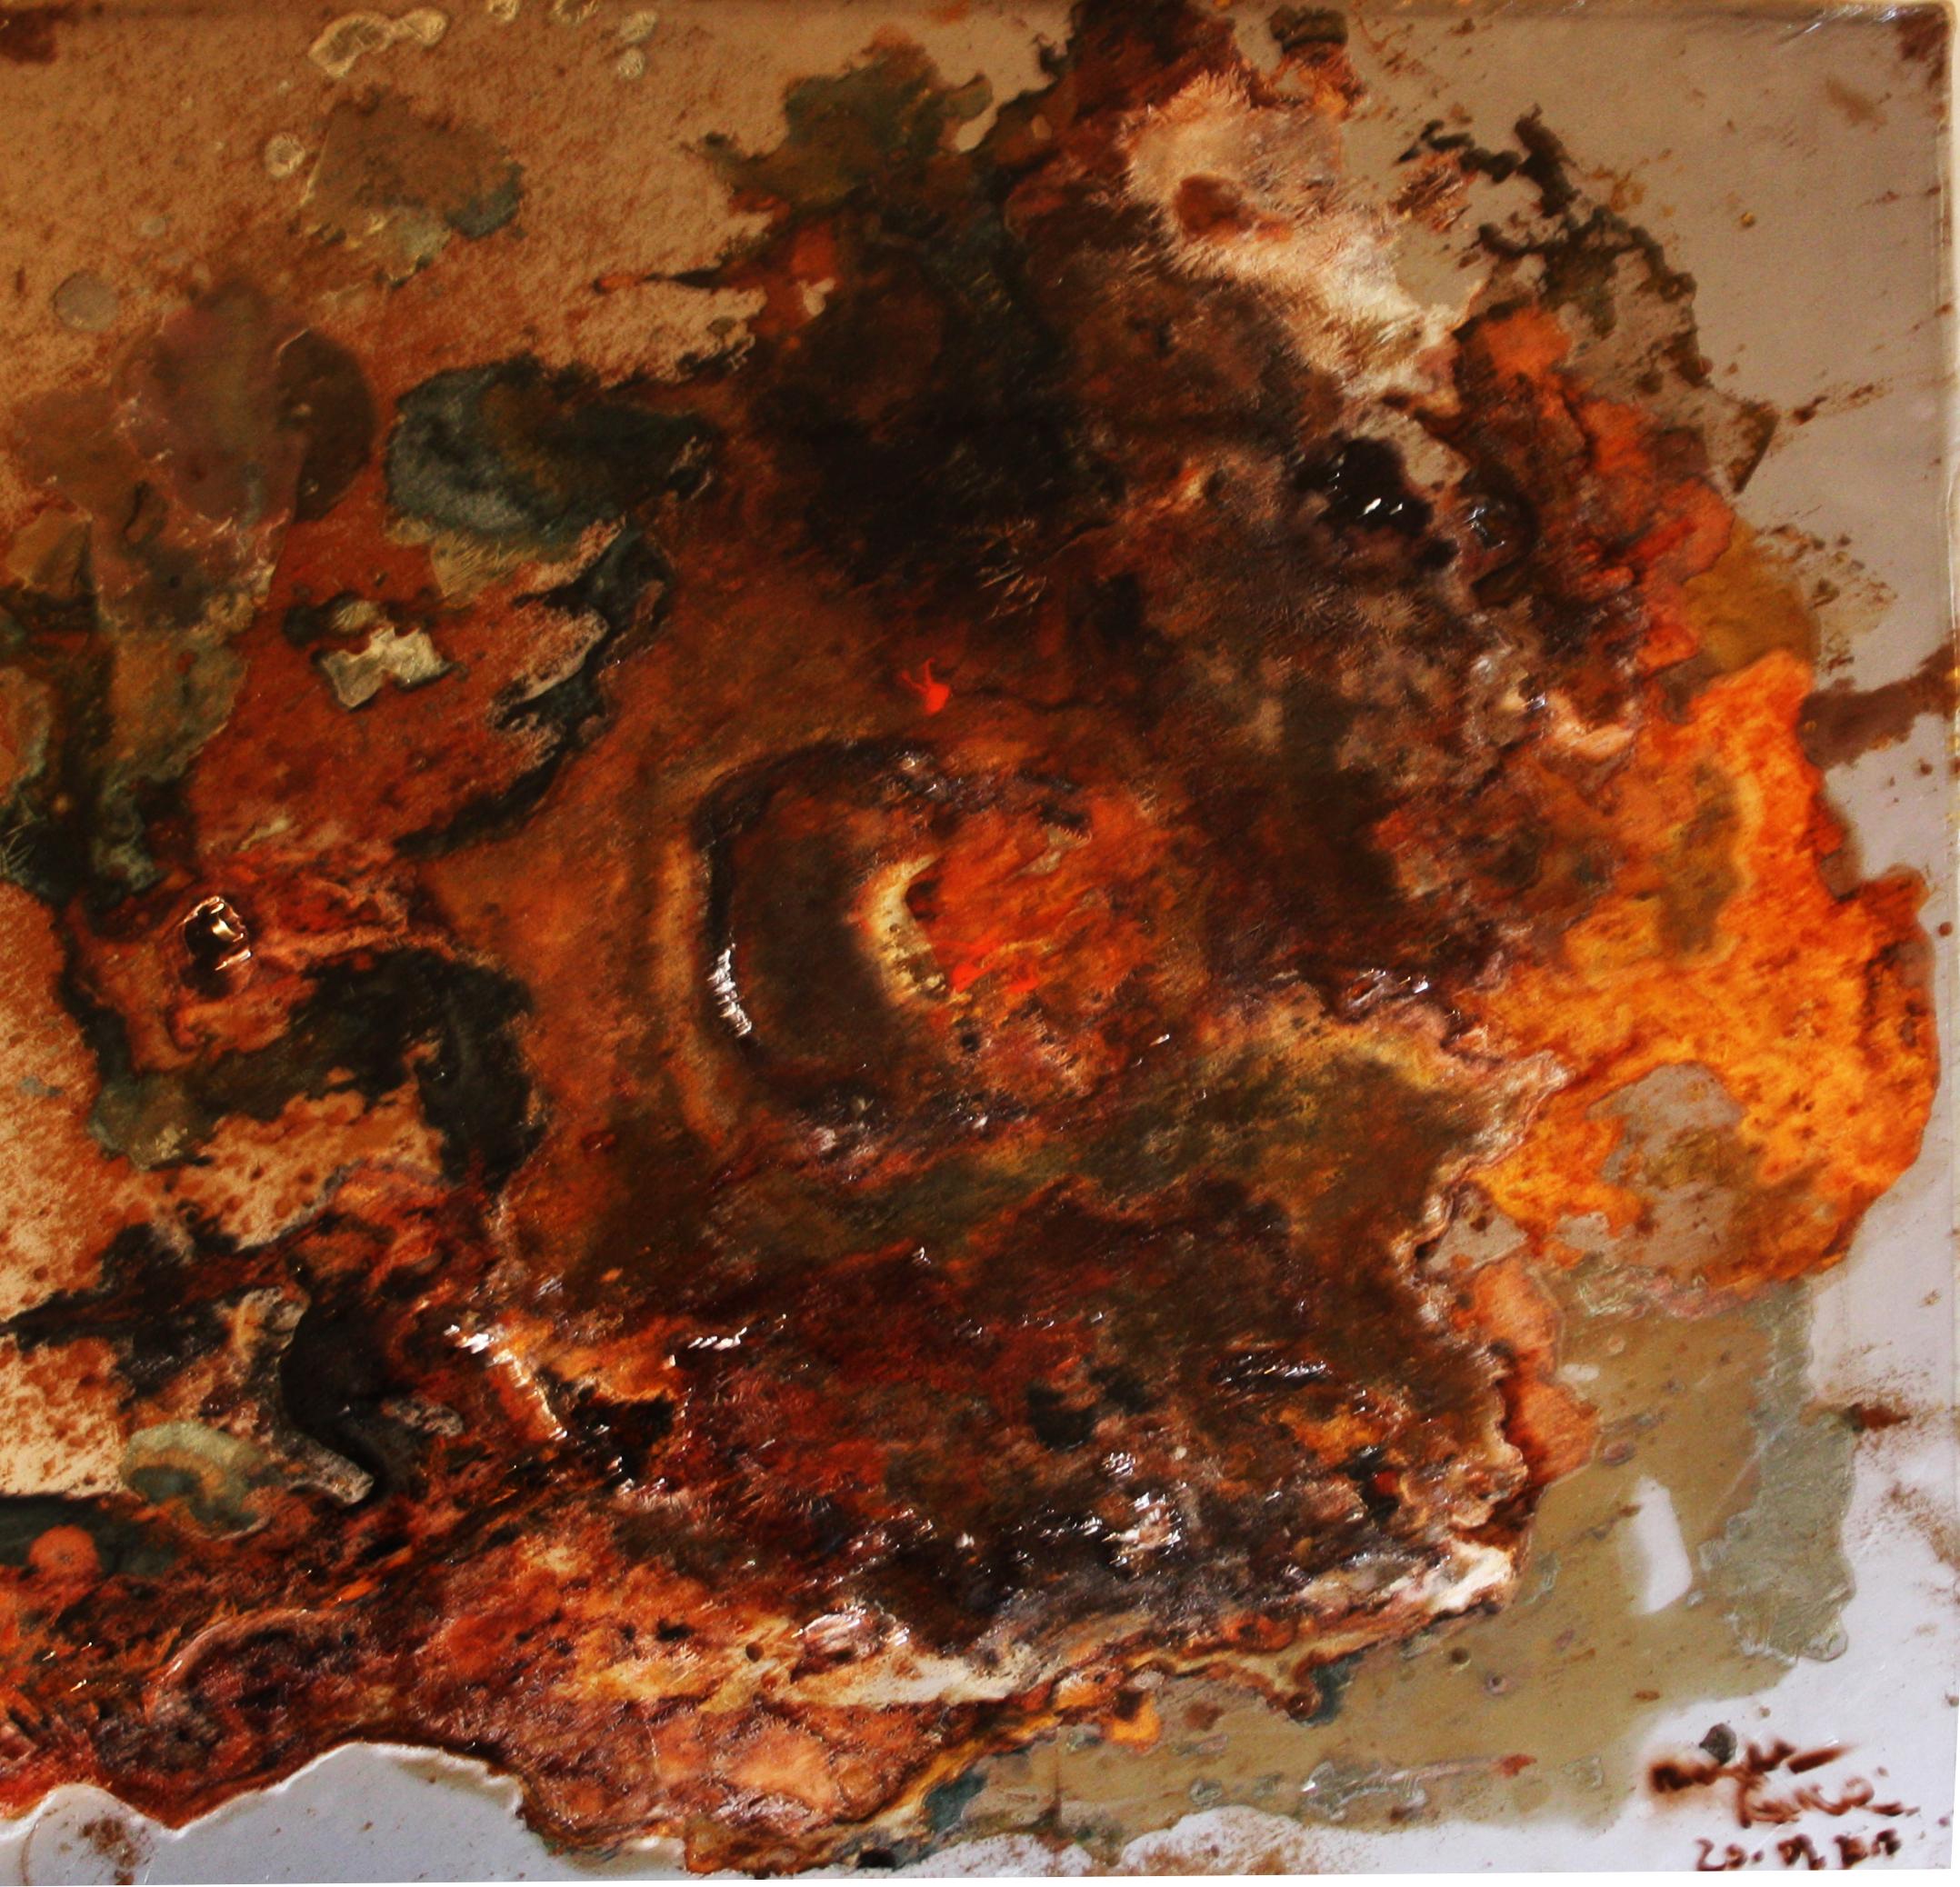 Arte Chimica dei Metalli - Acidatura Magmatica